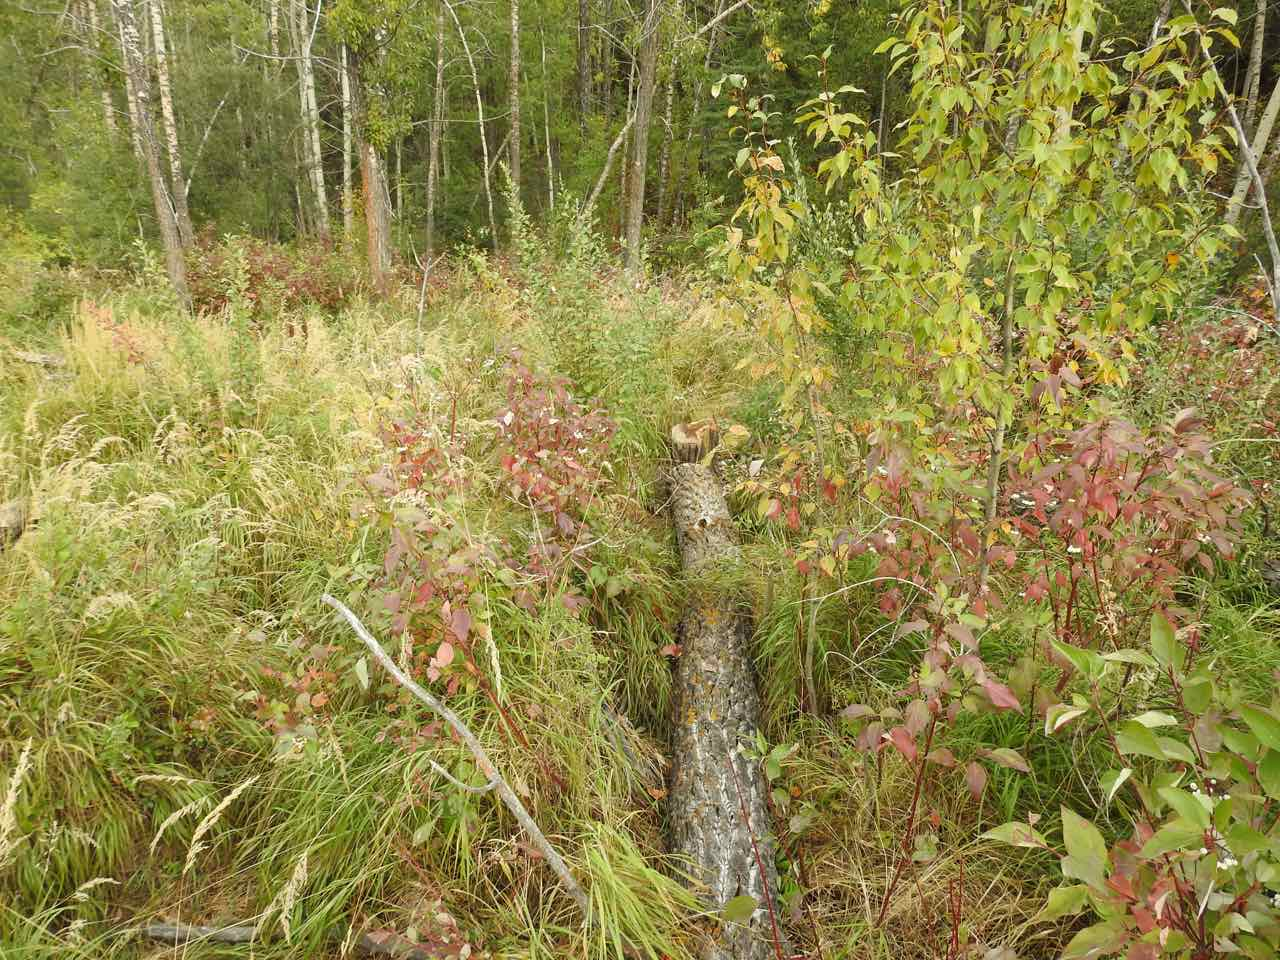 -Beaver_Pond-East_End-Beaver_Seeking_To_Dam_Further_Upstream_On_WC01-Tree_Fall_C_Sept_16_2017.jpg